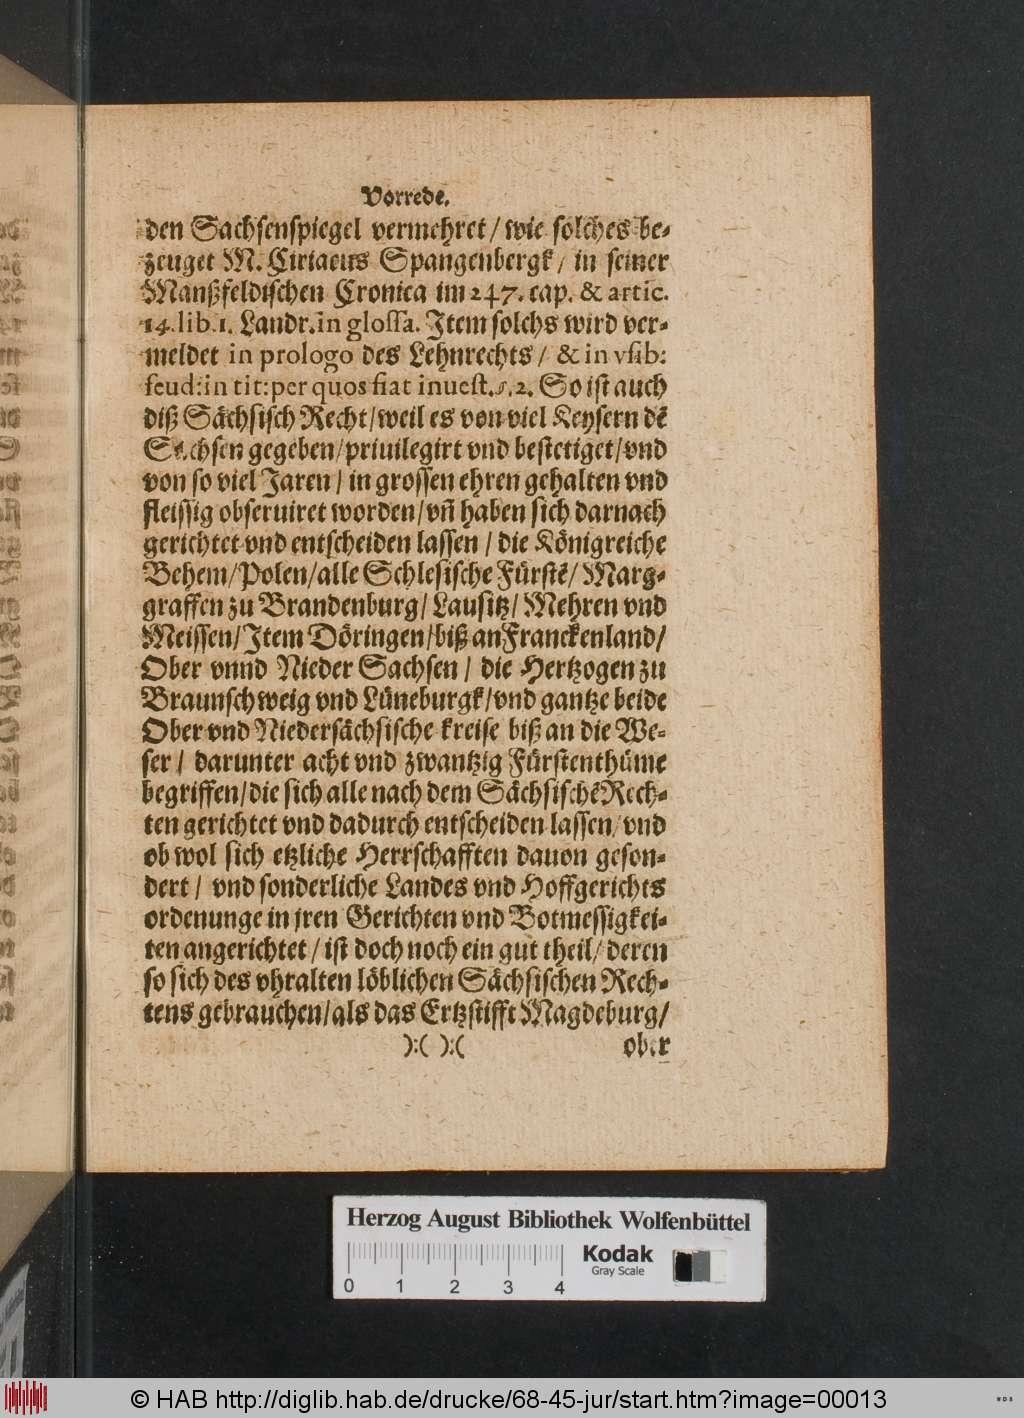 https://diglib.hab.de/drucke/68-45-jur/00013.jpg